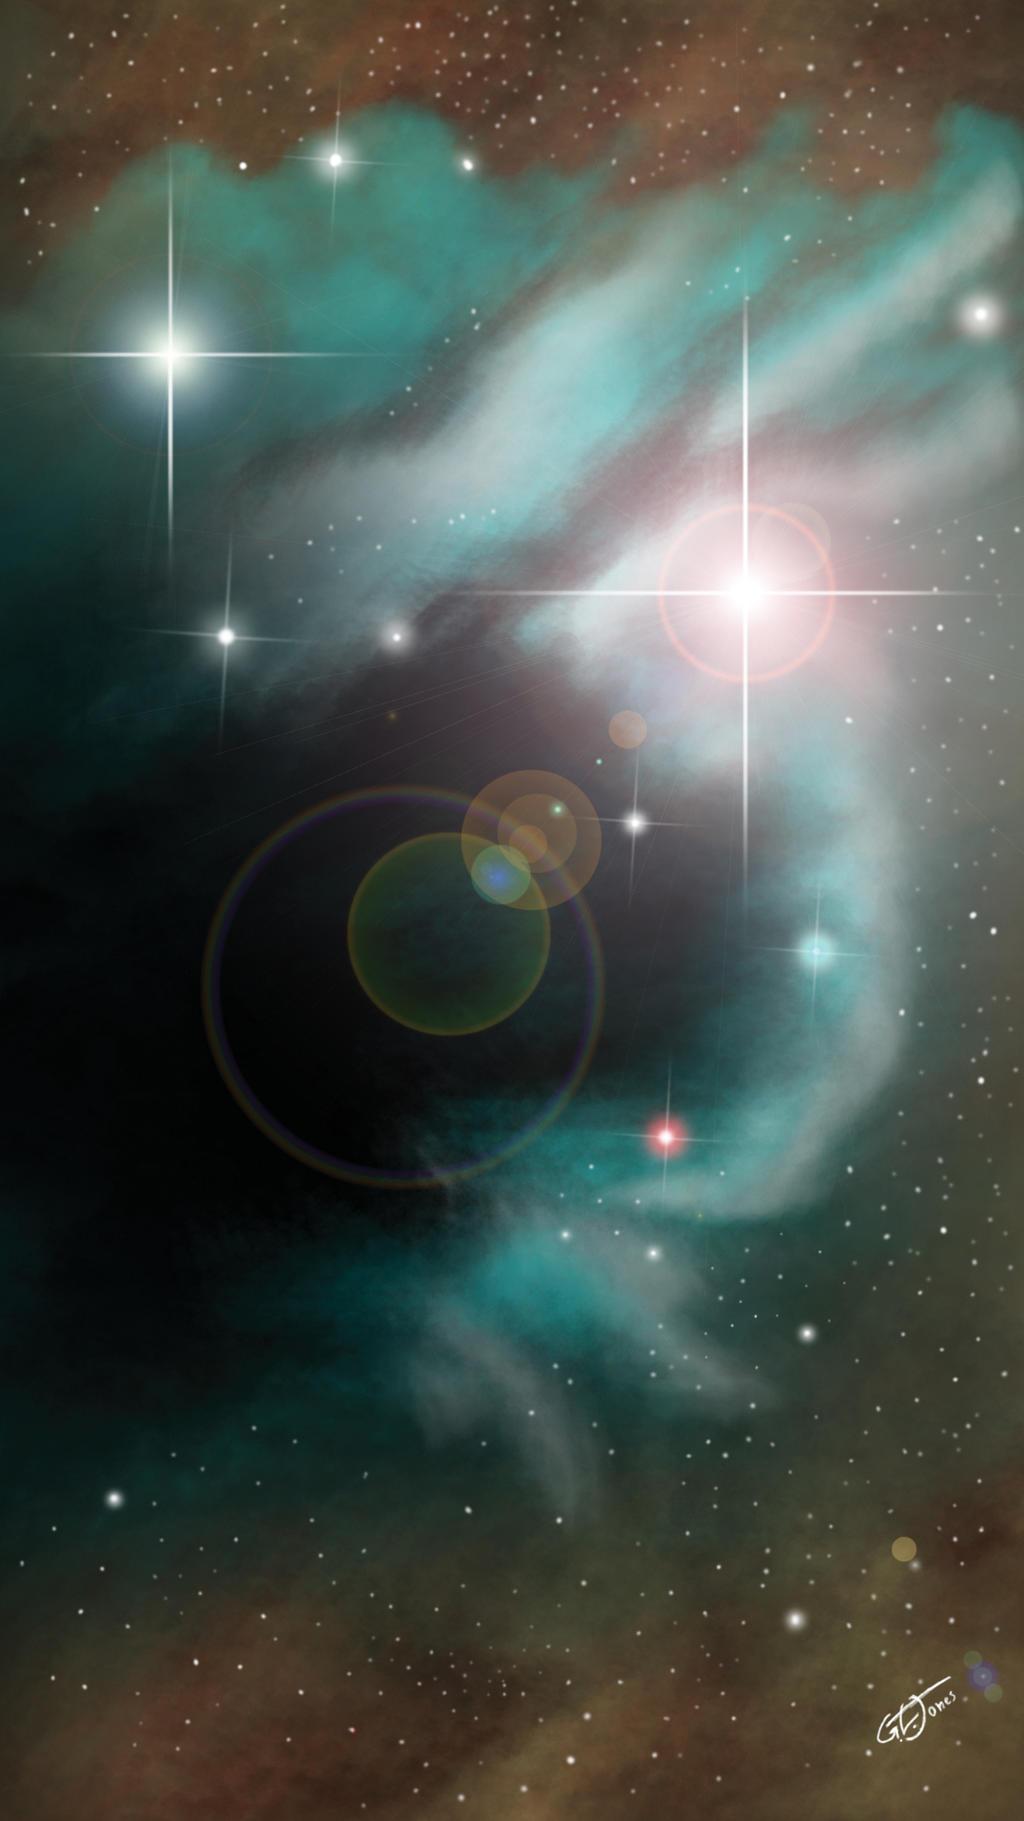 blue nebula in the brown cloud RGB